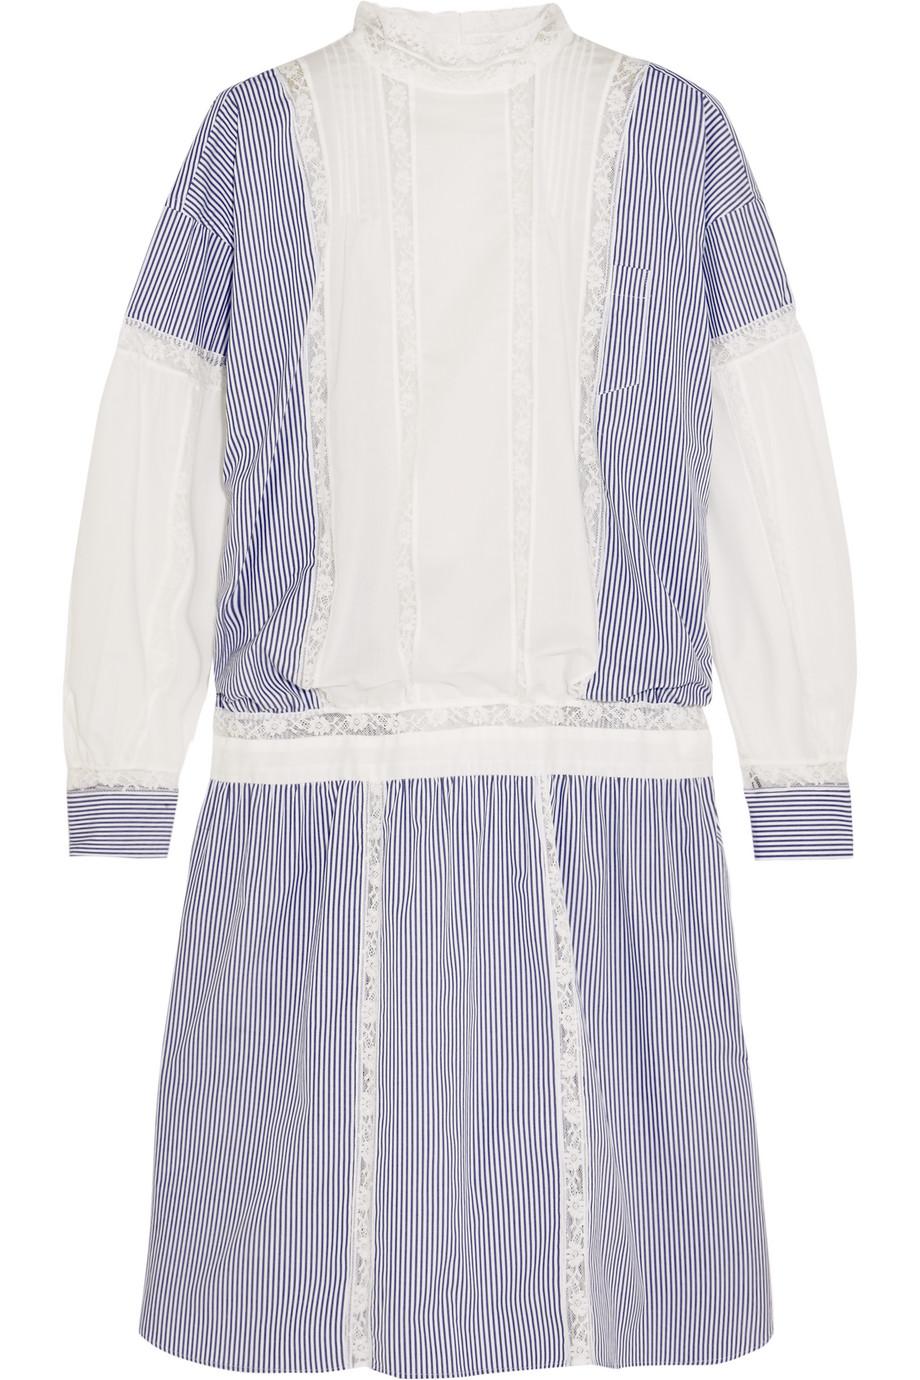 Sacai Lace-Trimmed Striped Cotton Dress, Light Blue, Women's - Striped, Size: 1